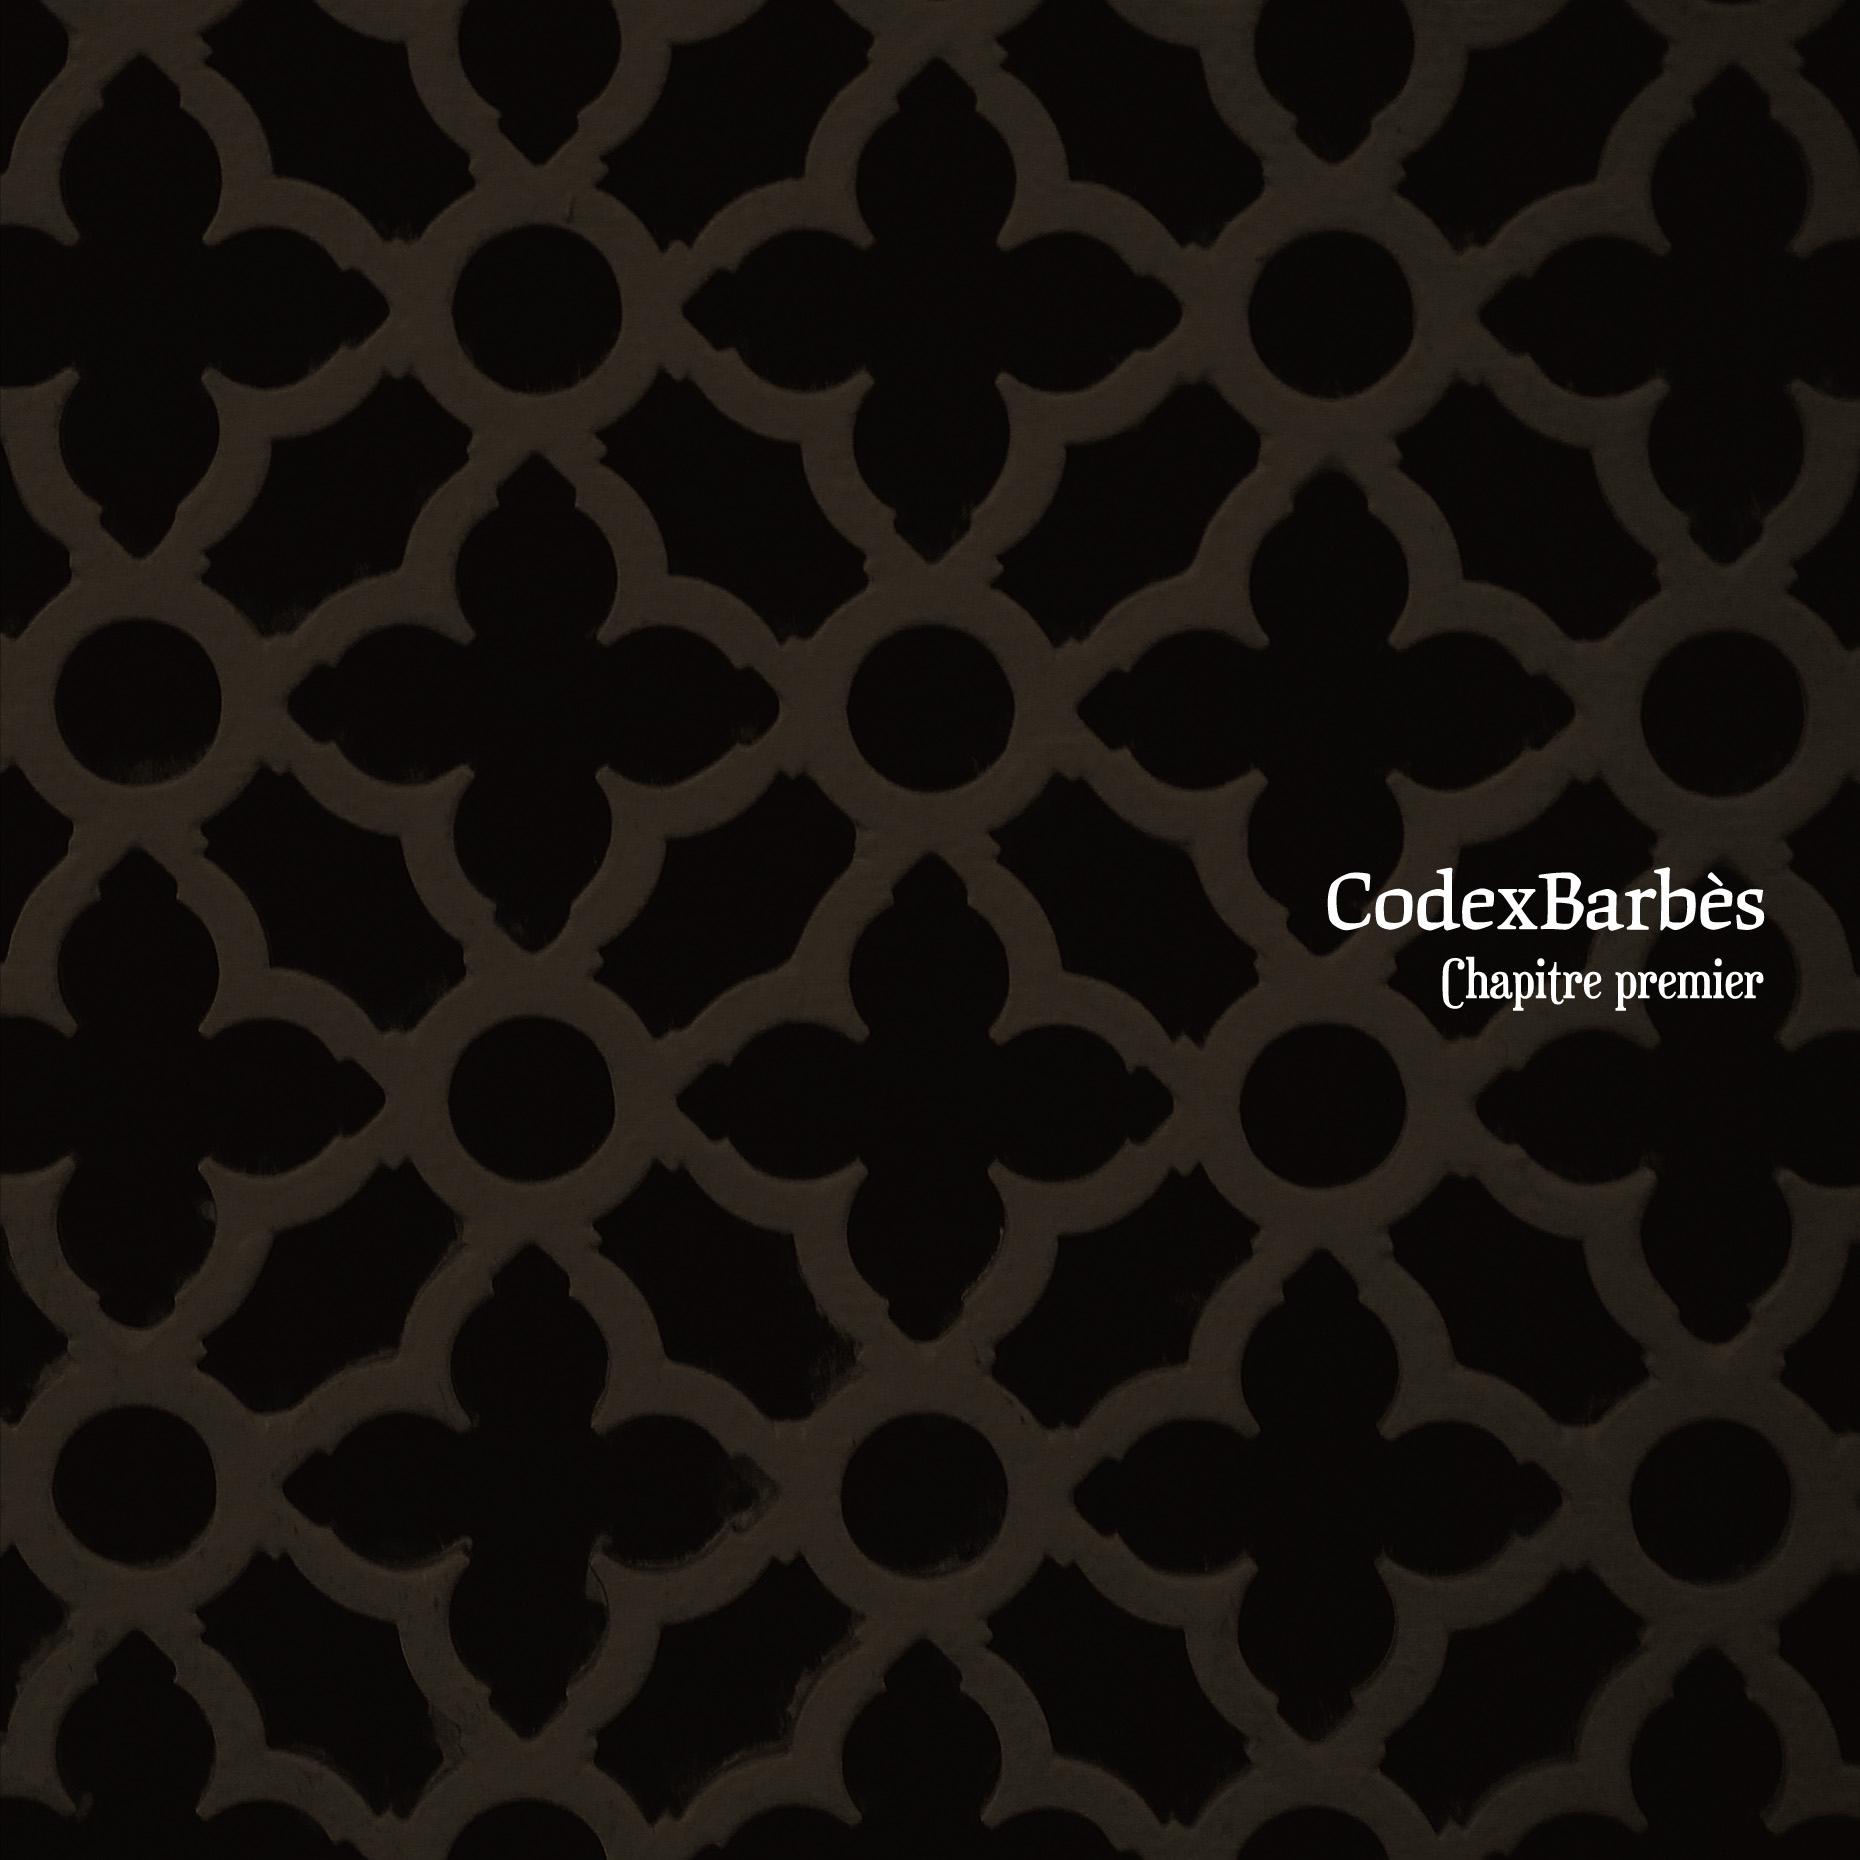 CodexBarbès_2P_sleeve135x135